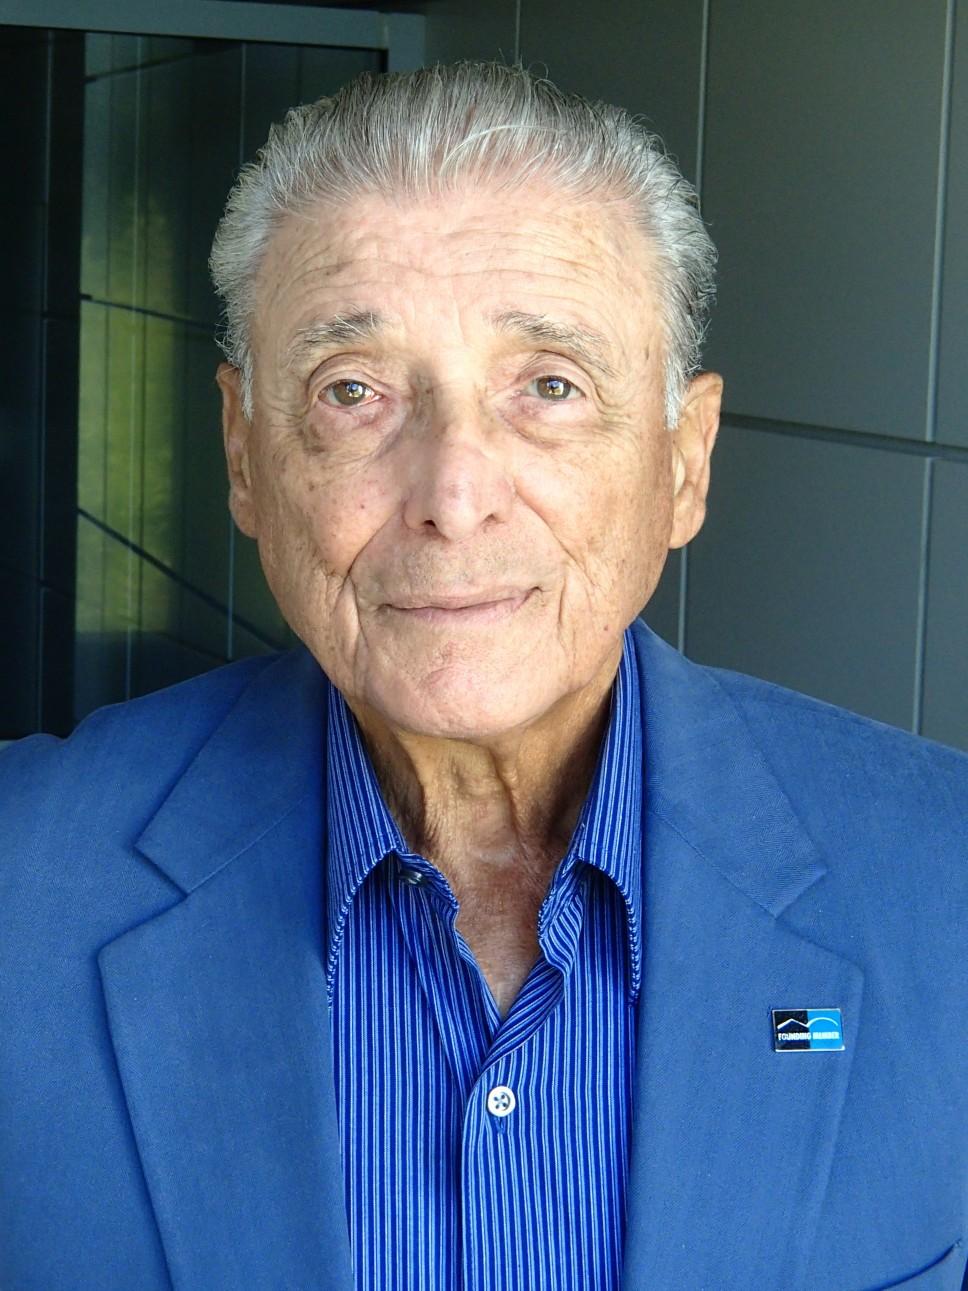 Holocaust Survivor Coming to LFA